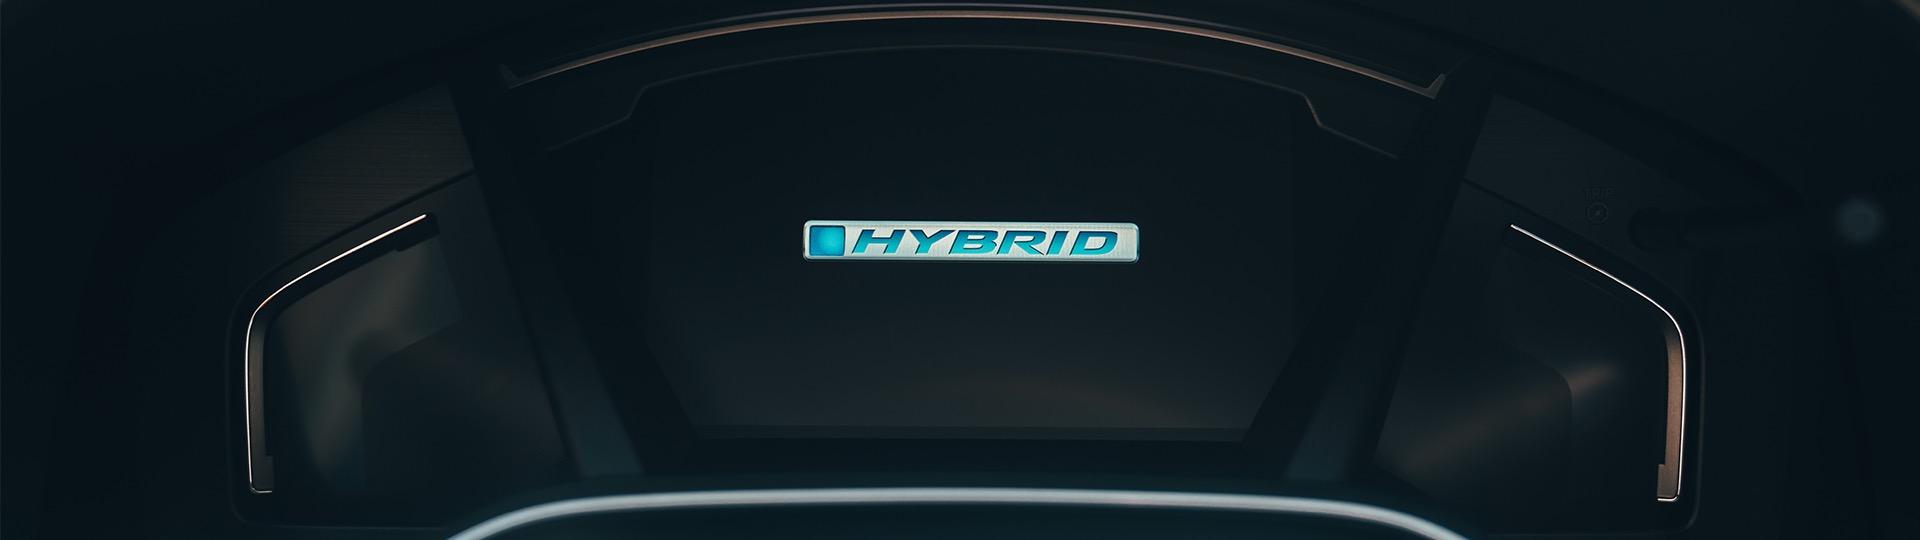 Executive+ Hybrid